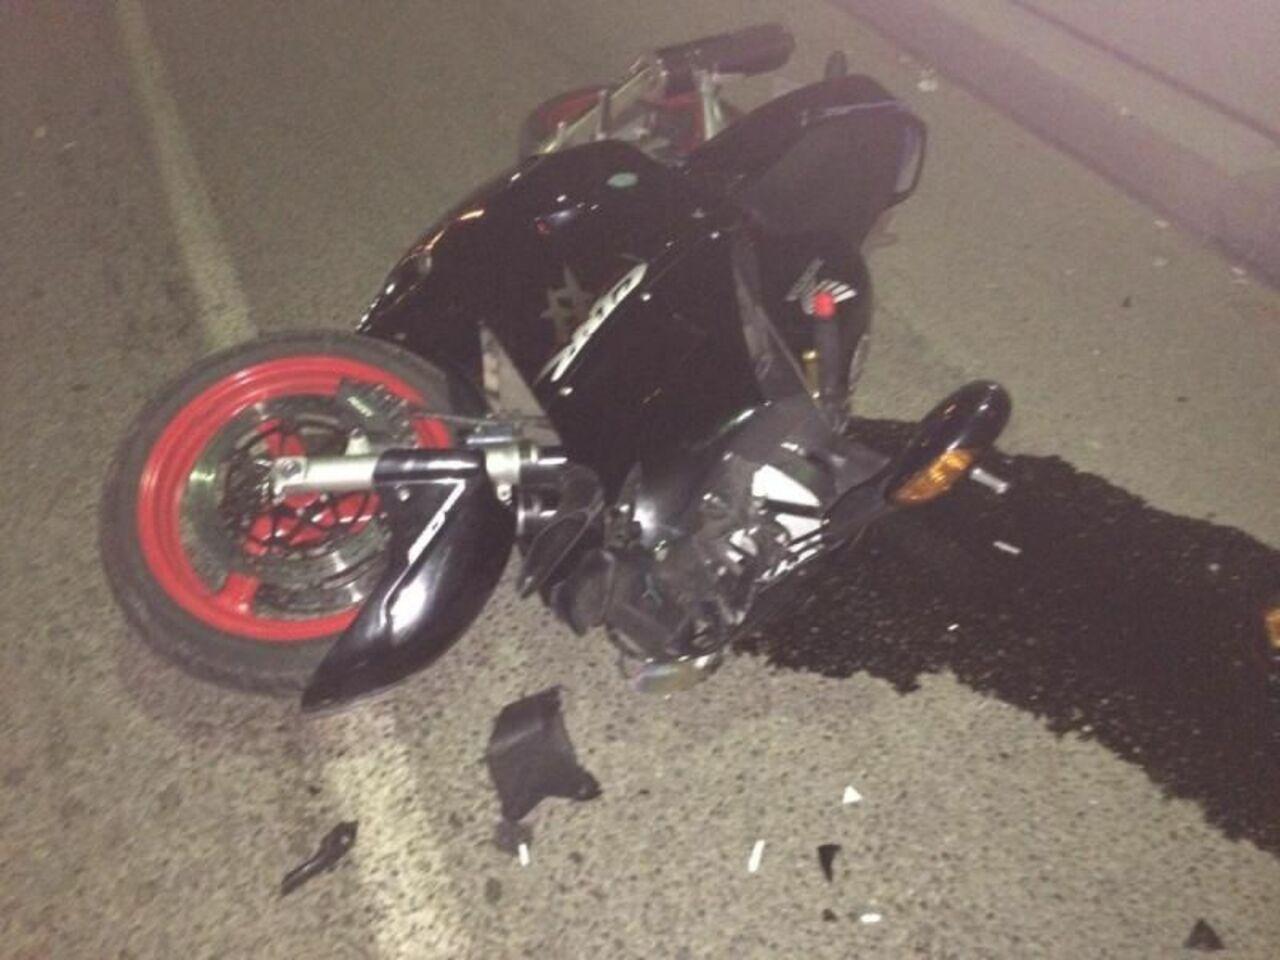 ВАнжеро-Судженске разбился насмерть 30-летний мотоциклист